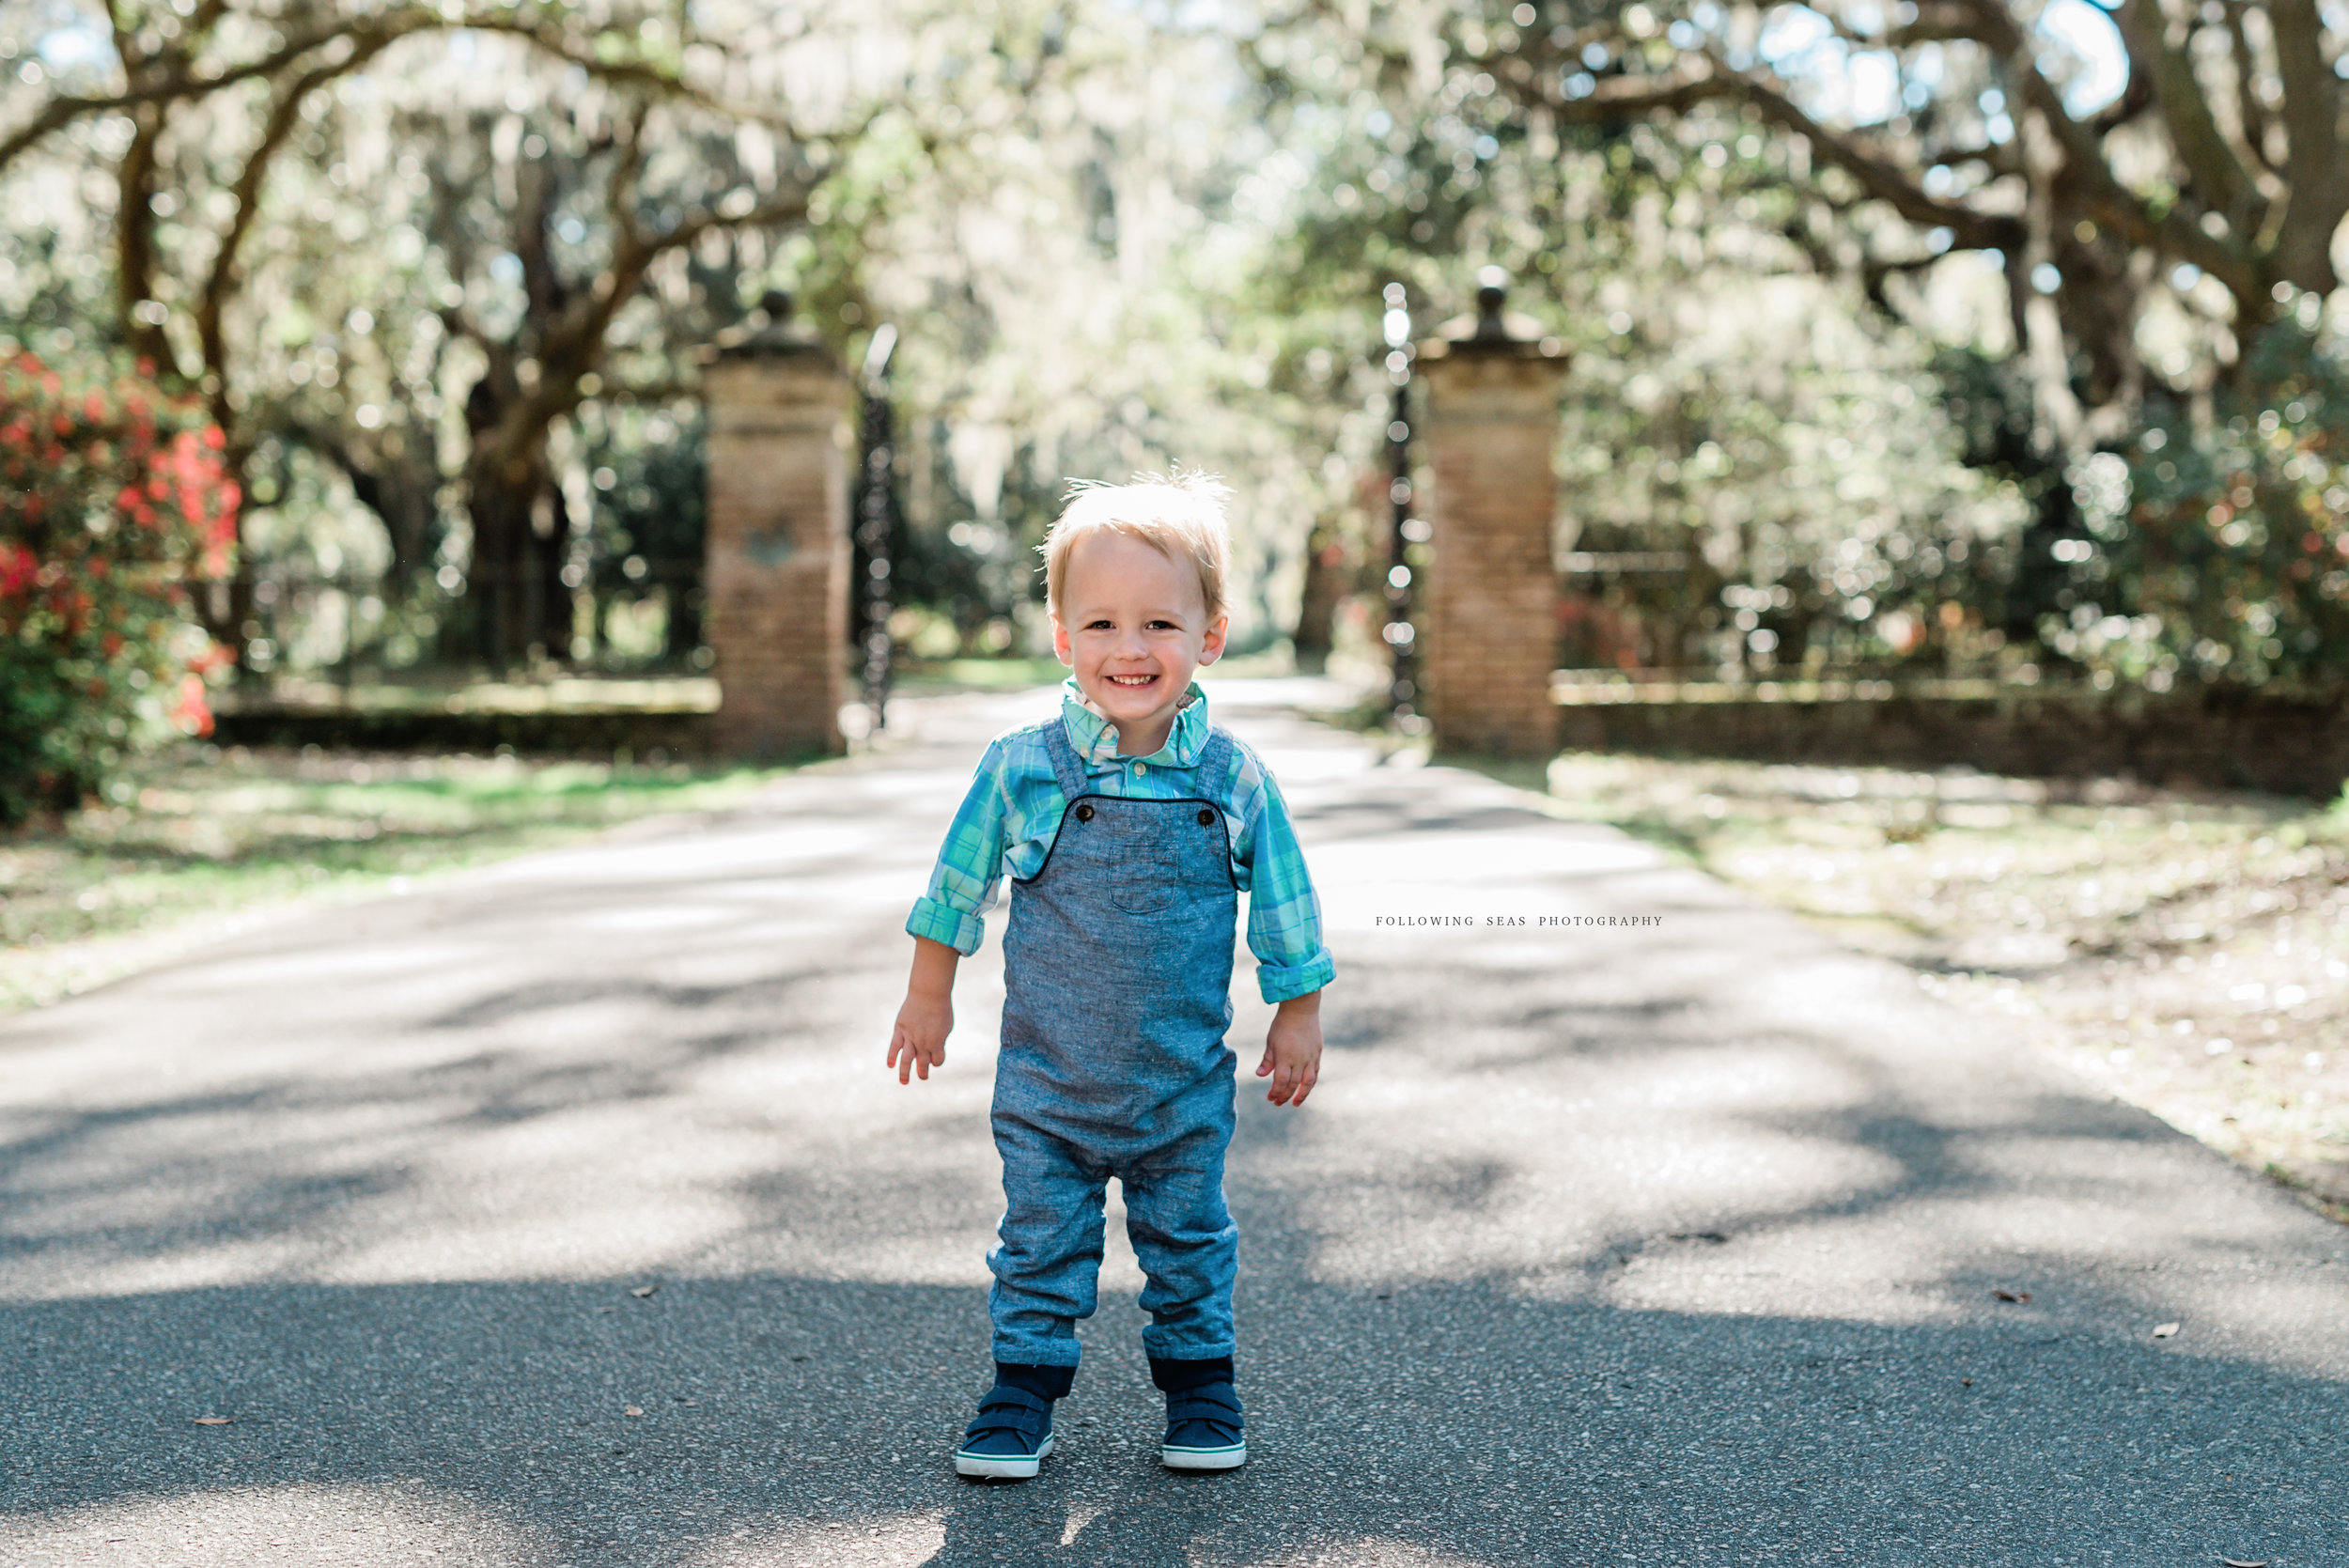 Charleston-Family-Photographer-Following-Seas-Photography-FSP_0499.jpg